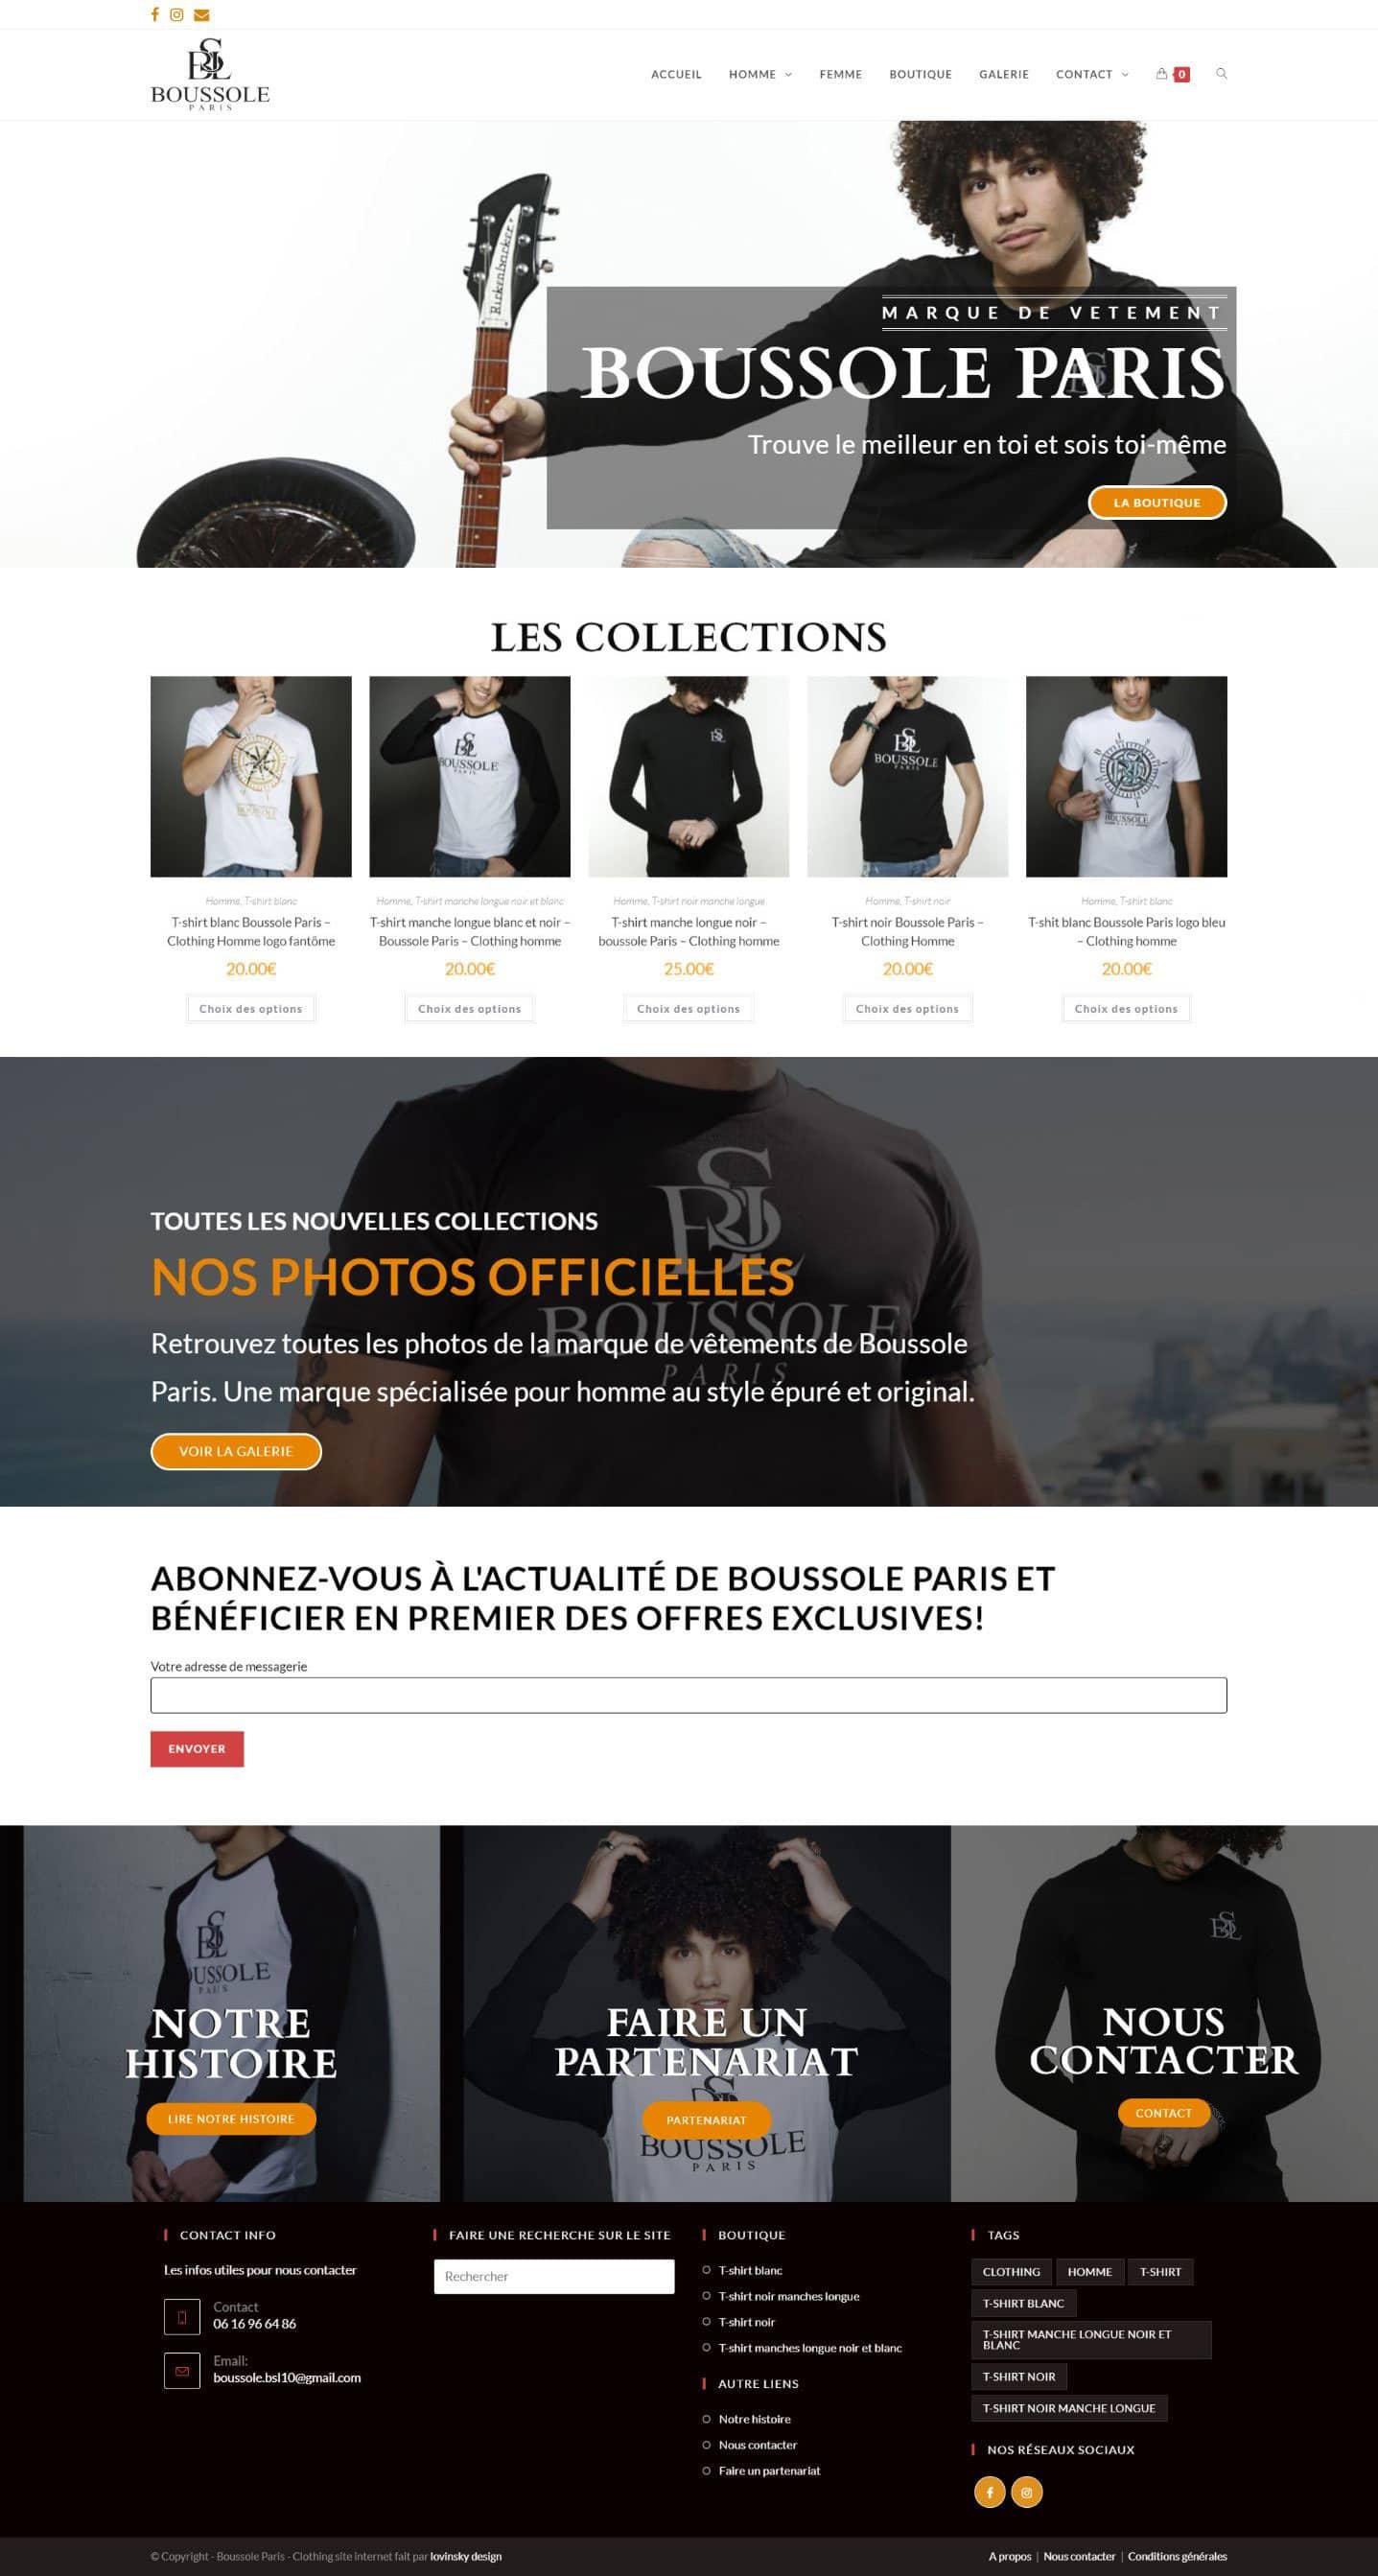 boussole-paris-cas-pratique-by-lovinsky-graphiste-webdesigner-freelance-nantes-44